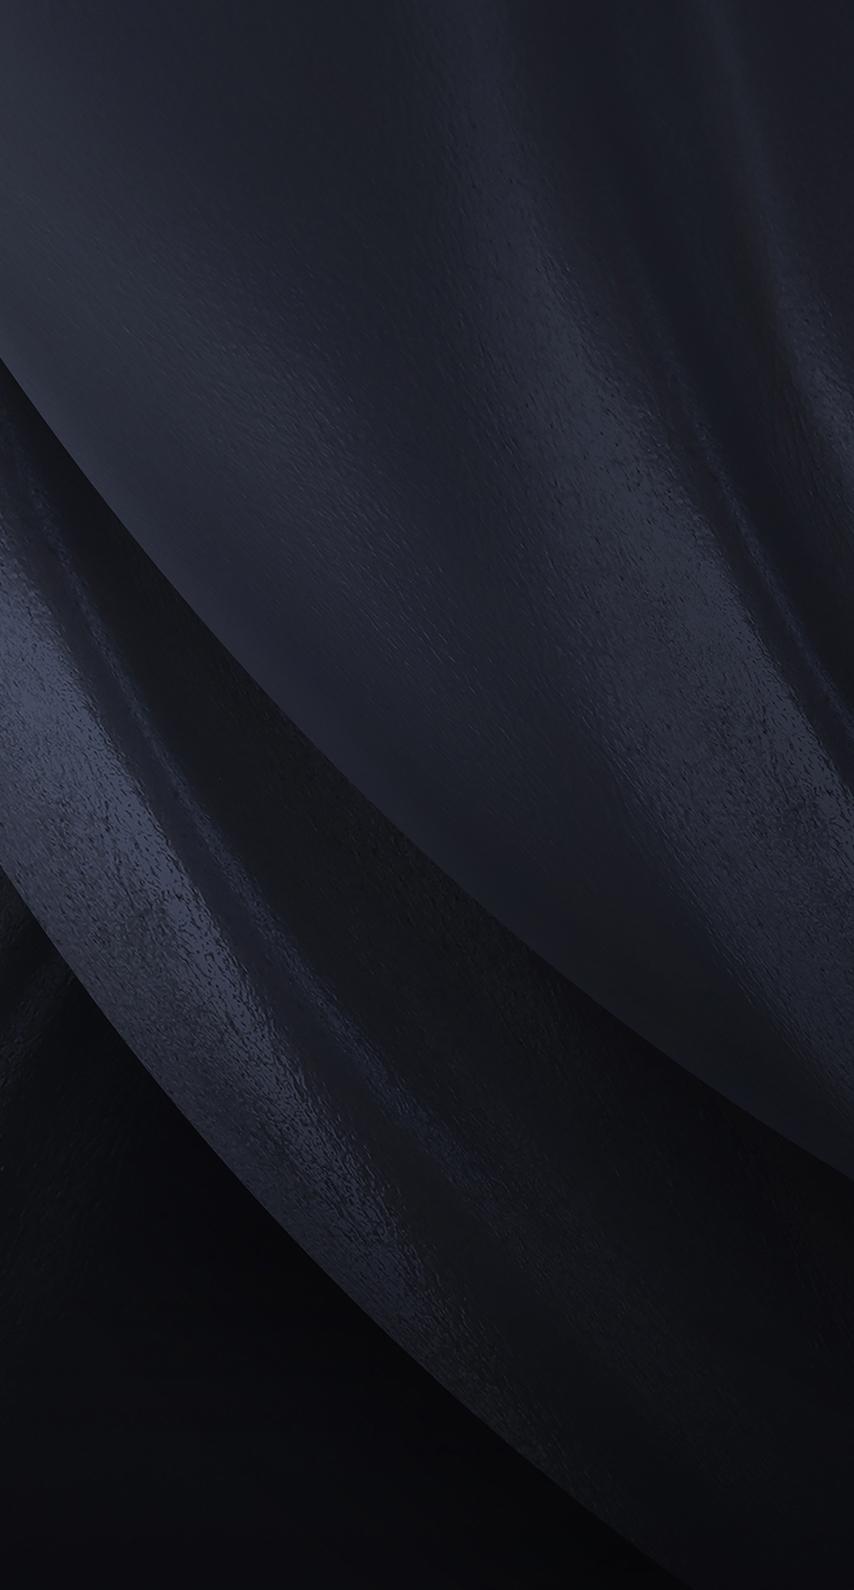 textile, royalty